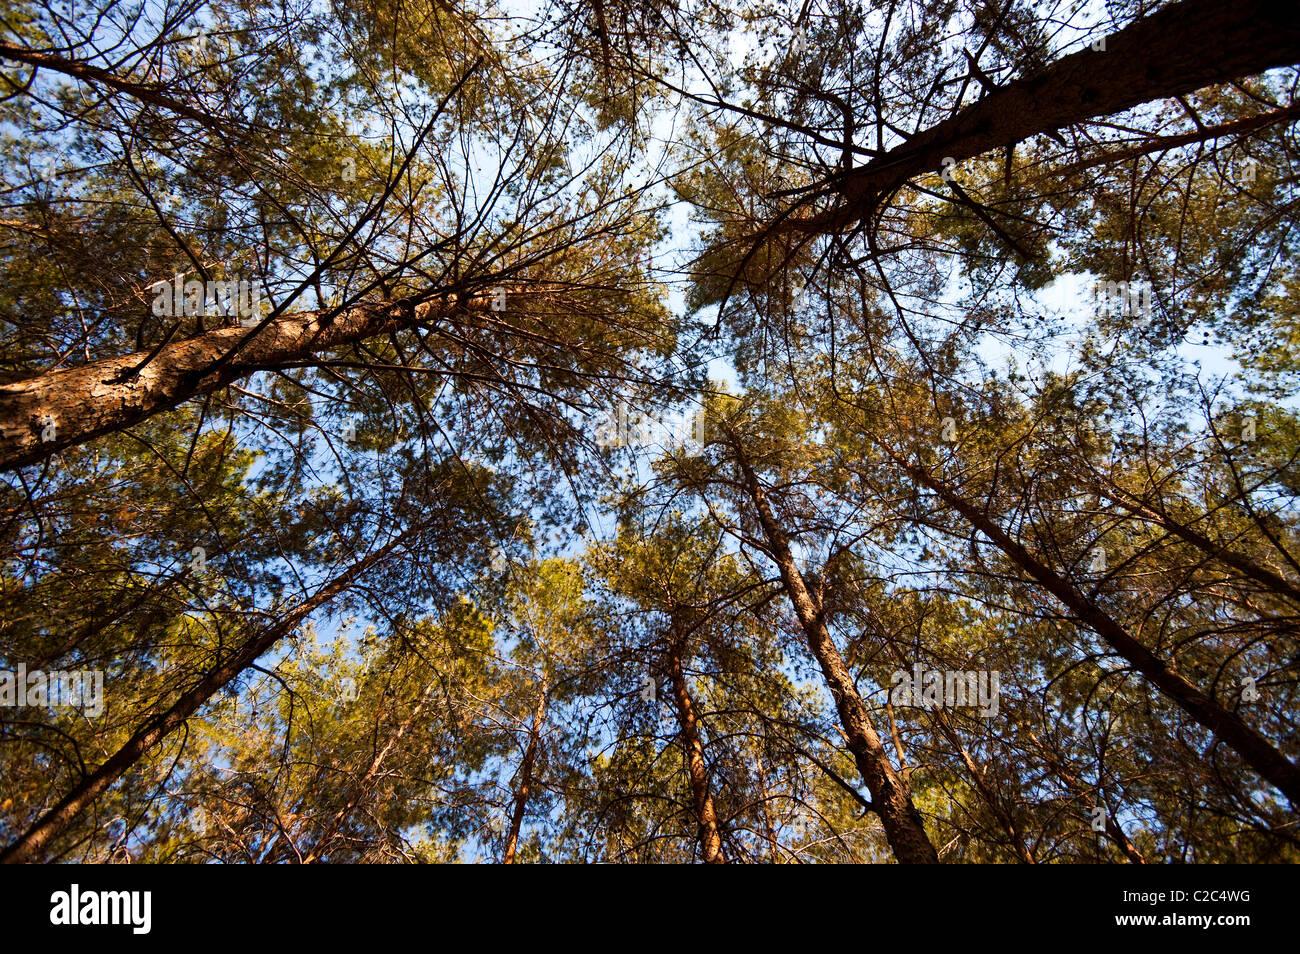 Pine forest outside Jerusalem - Stock Image